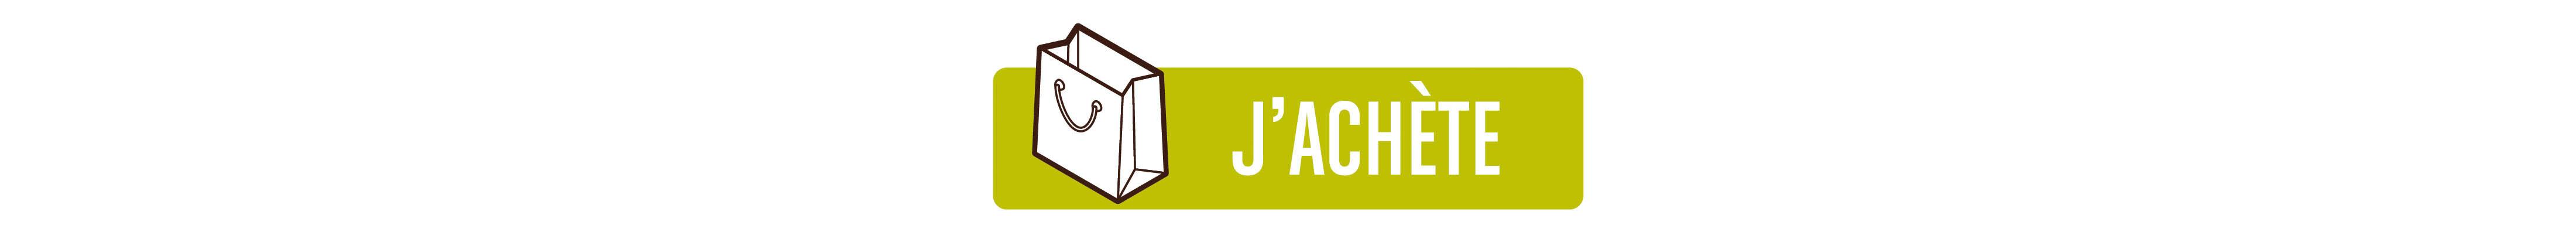 Belledonne Boutons BISCUITS Jachete